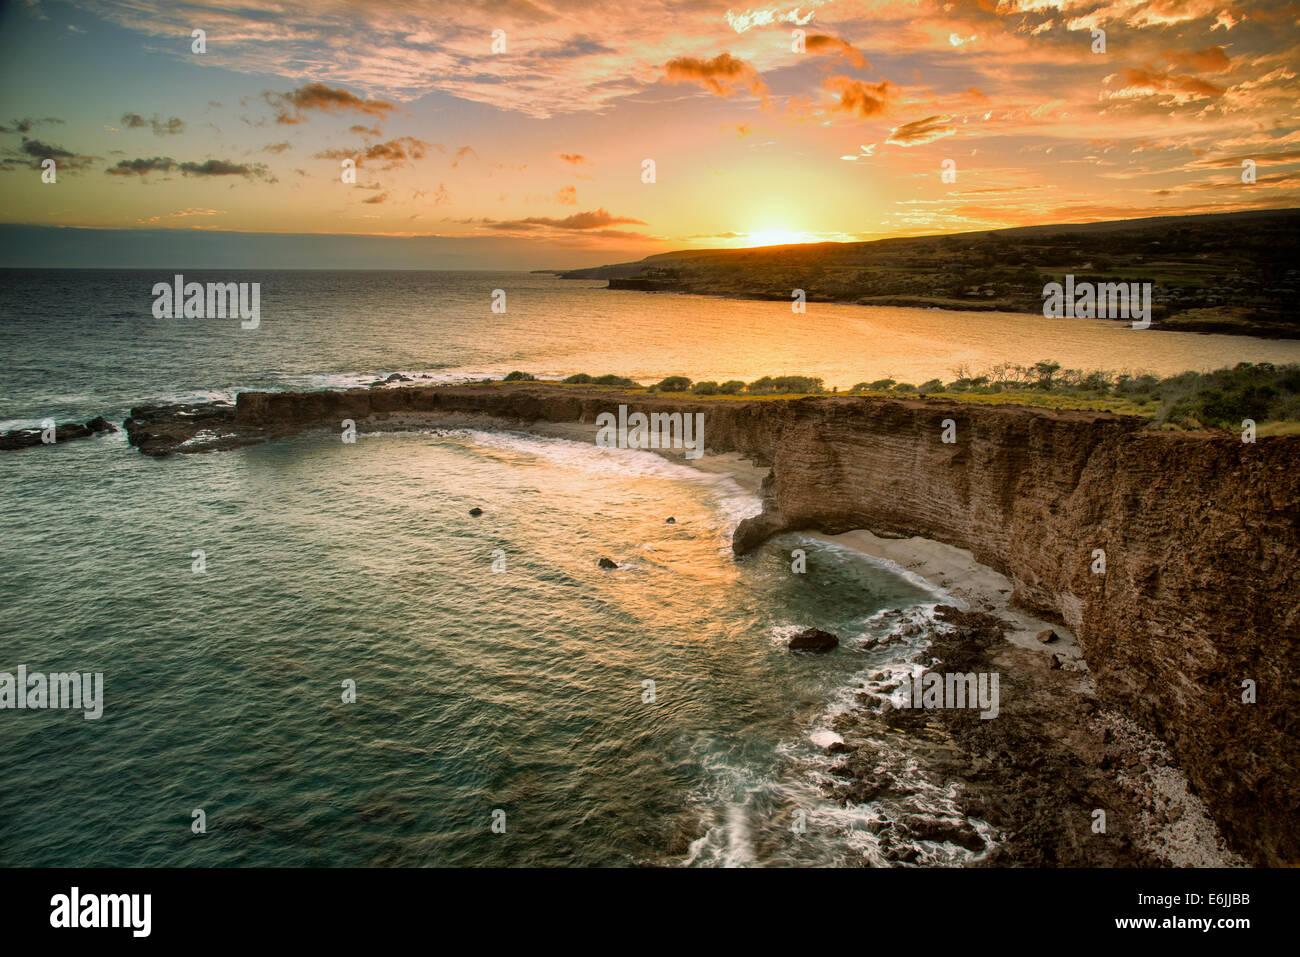 Coucher du soleil à Sweetheart Rock, Lanai, Hawaii. Photo Stock